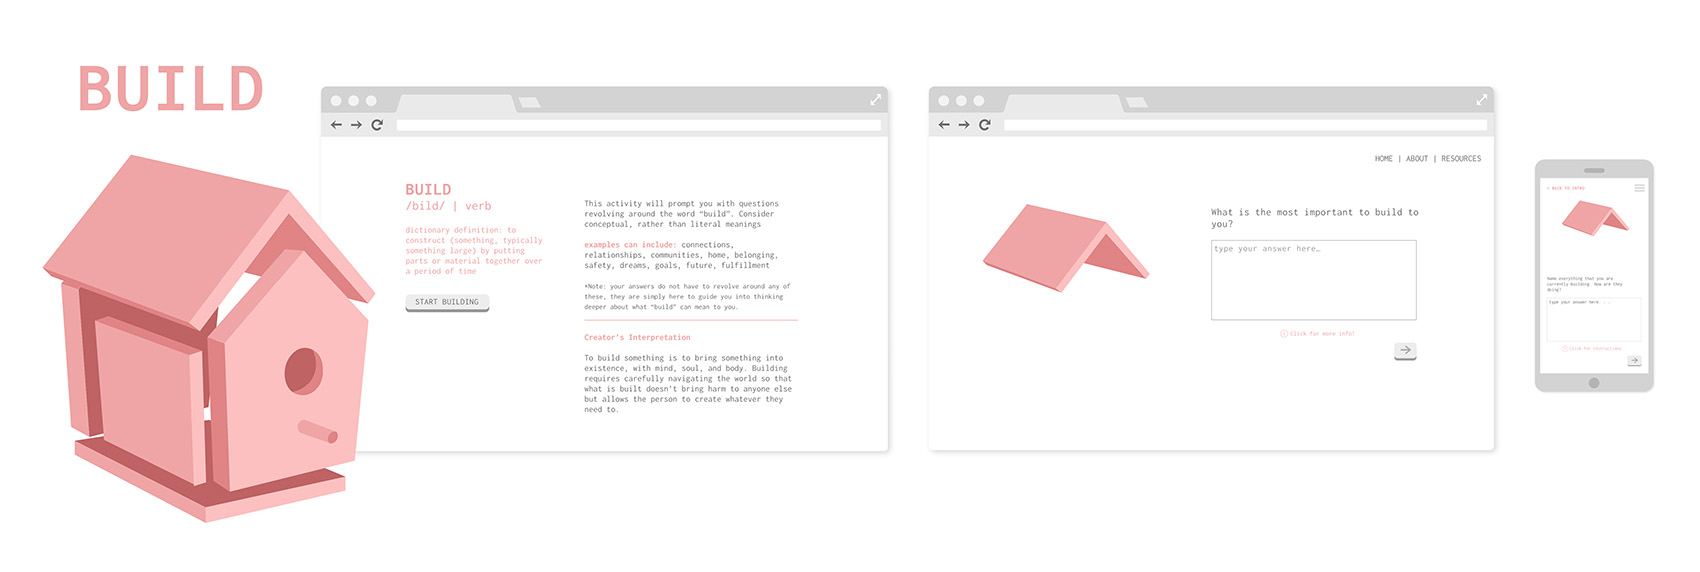 intro-build.jpg